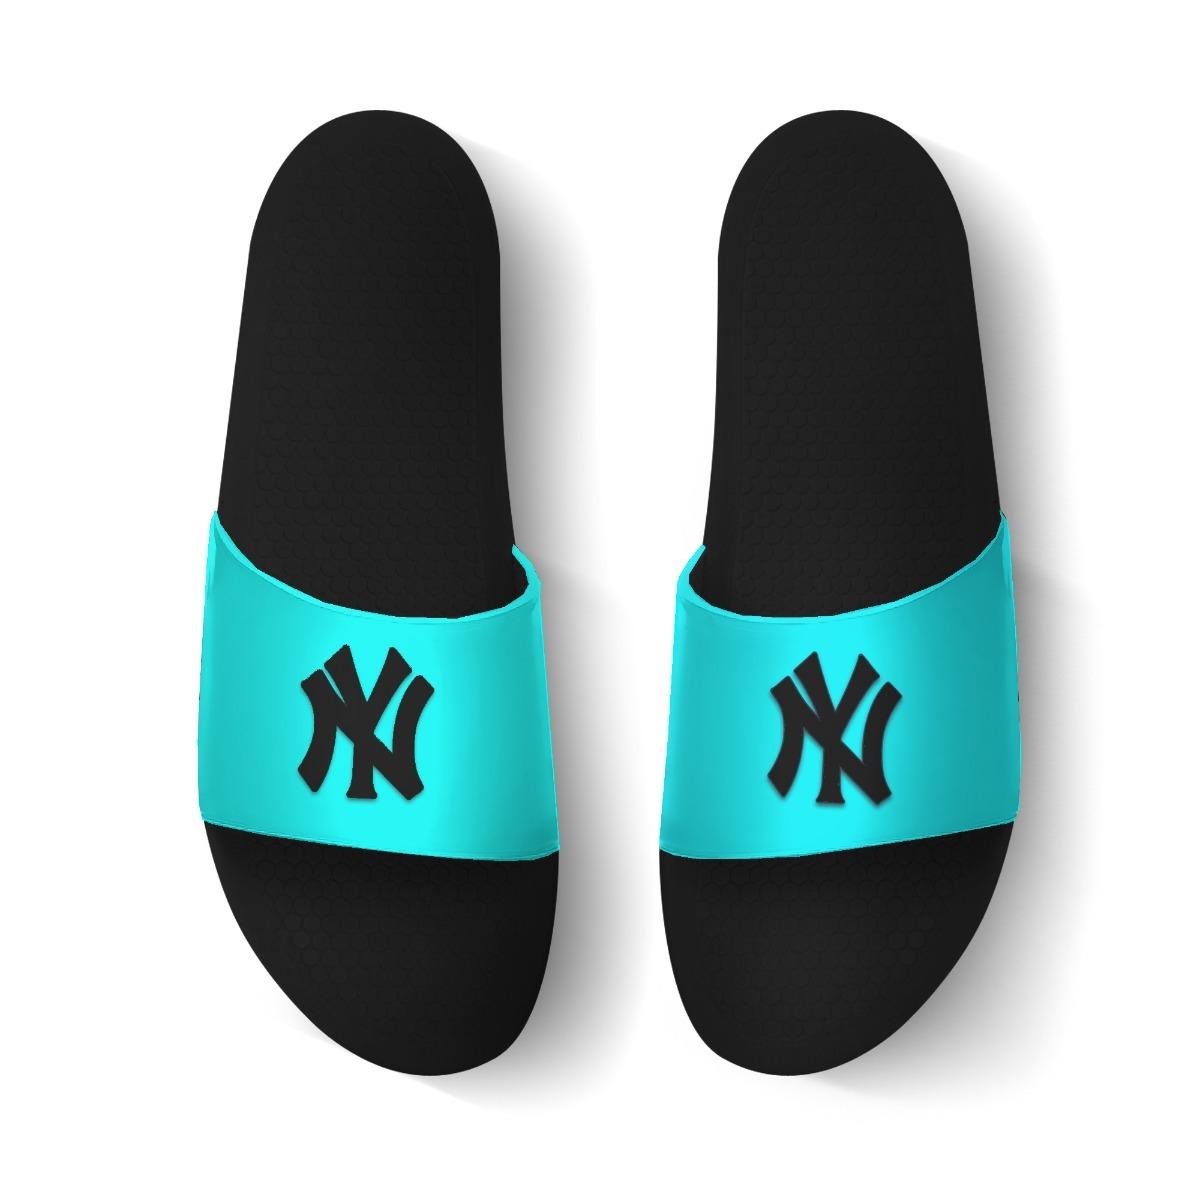 041e98aaee chinelo chinela slide sandália benassi new york yanks nova. Carregando zoom.